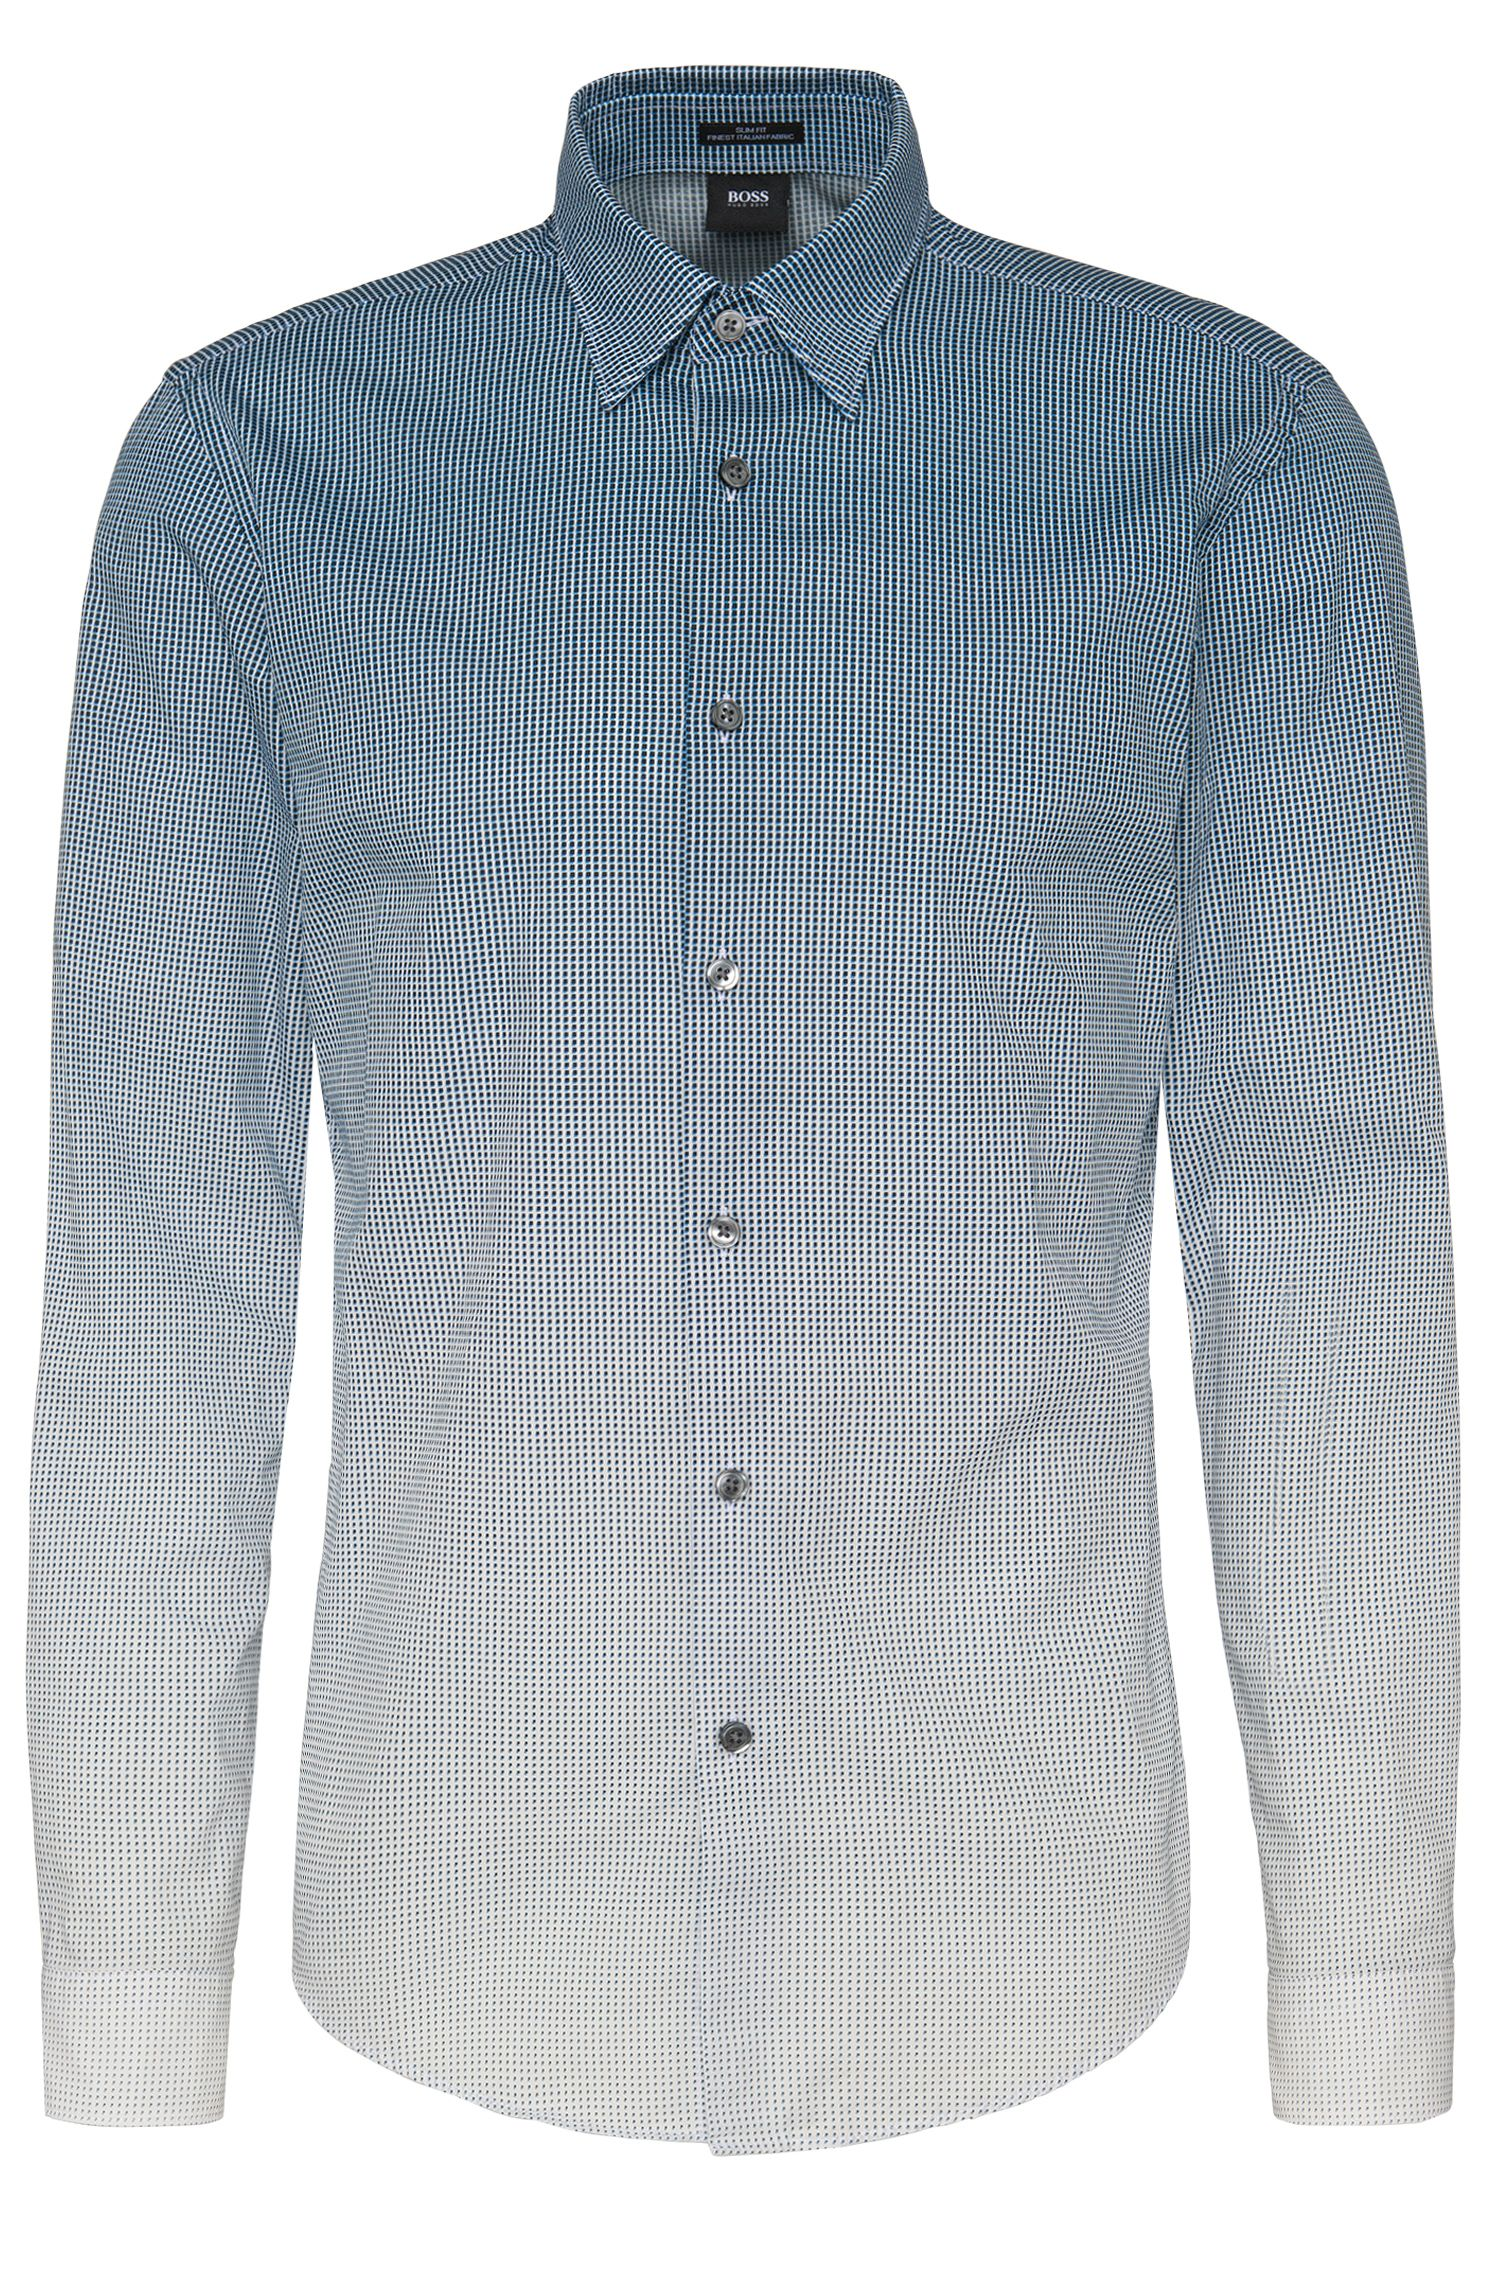 'Rodney FO' | Slim Fit, Cotton Button Down Shirt